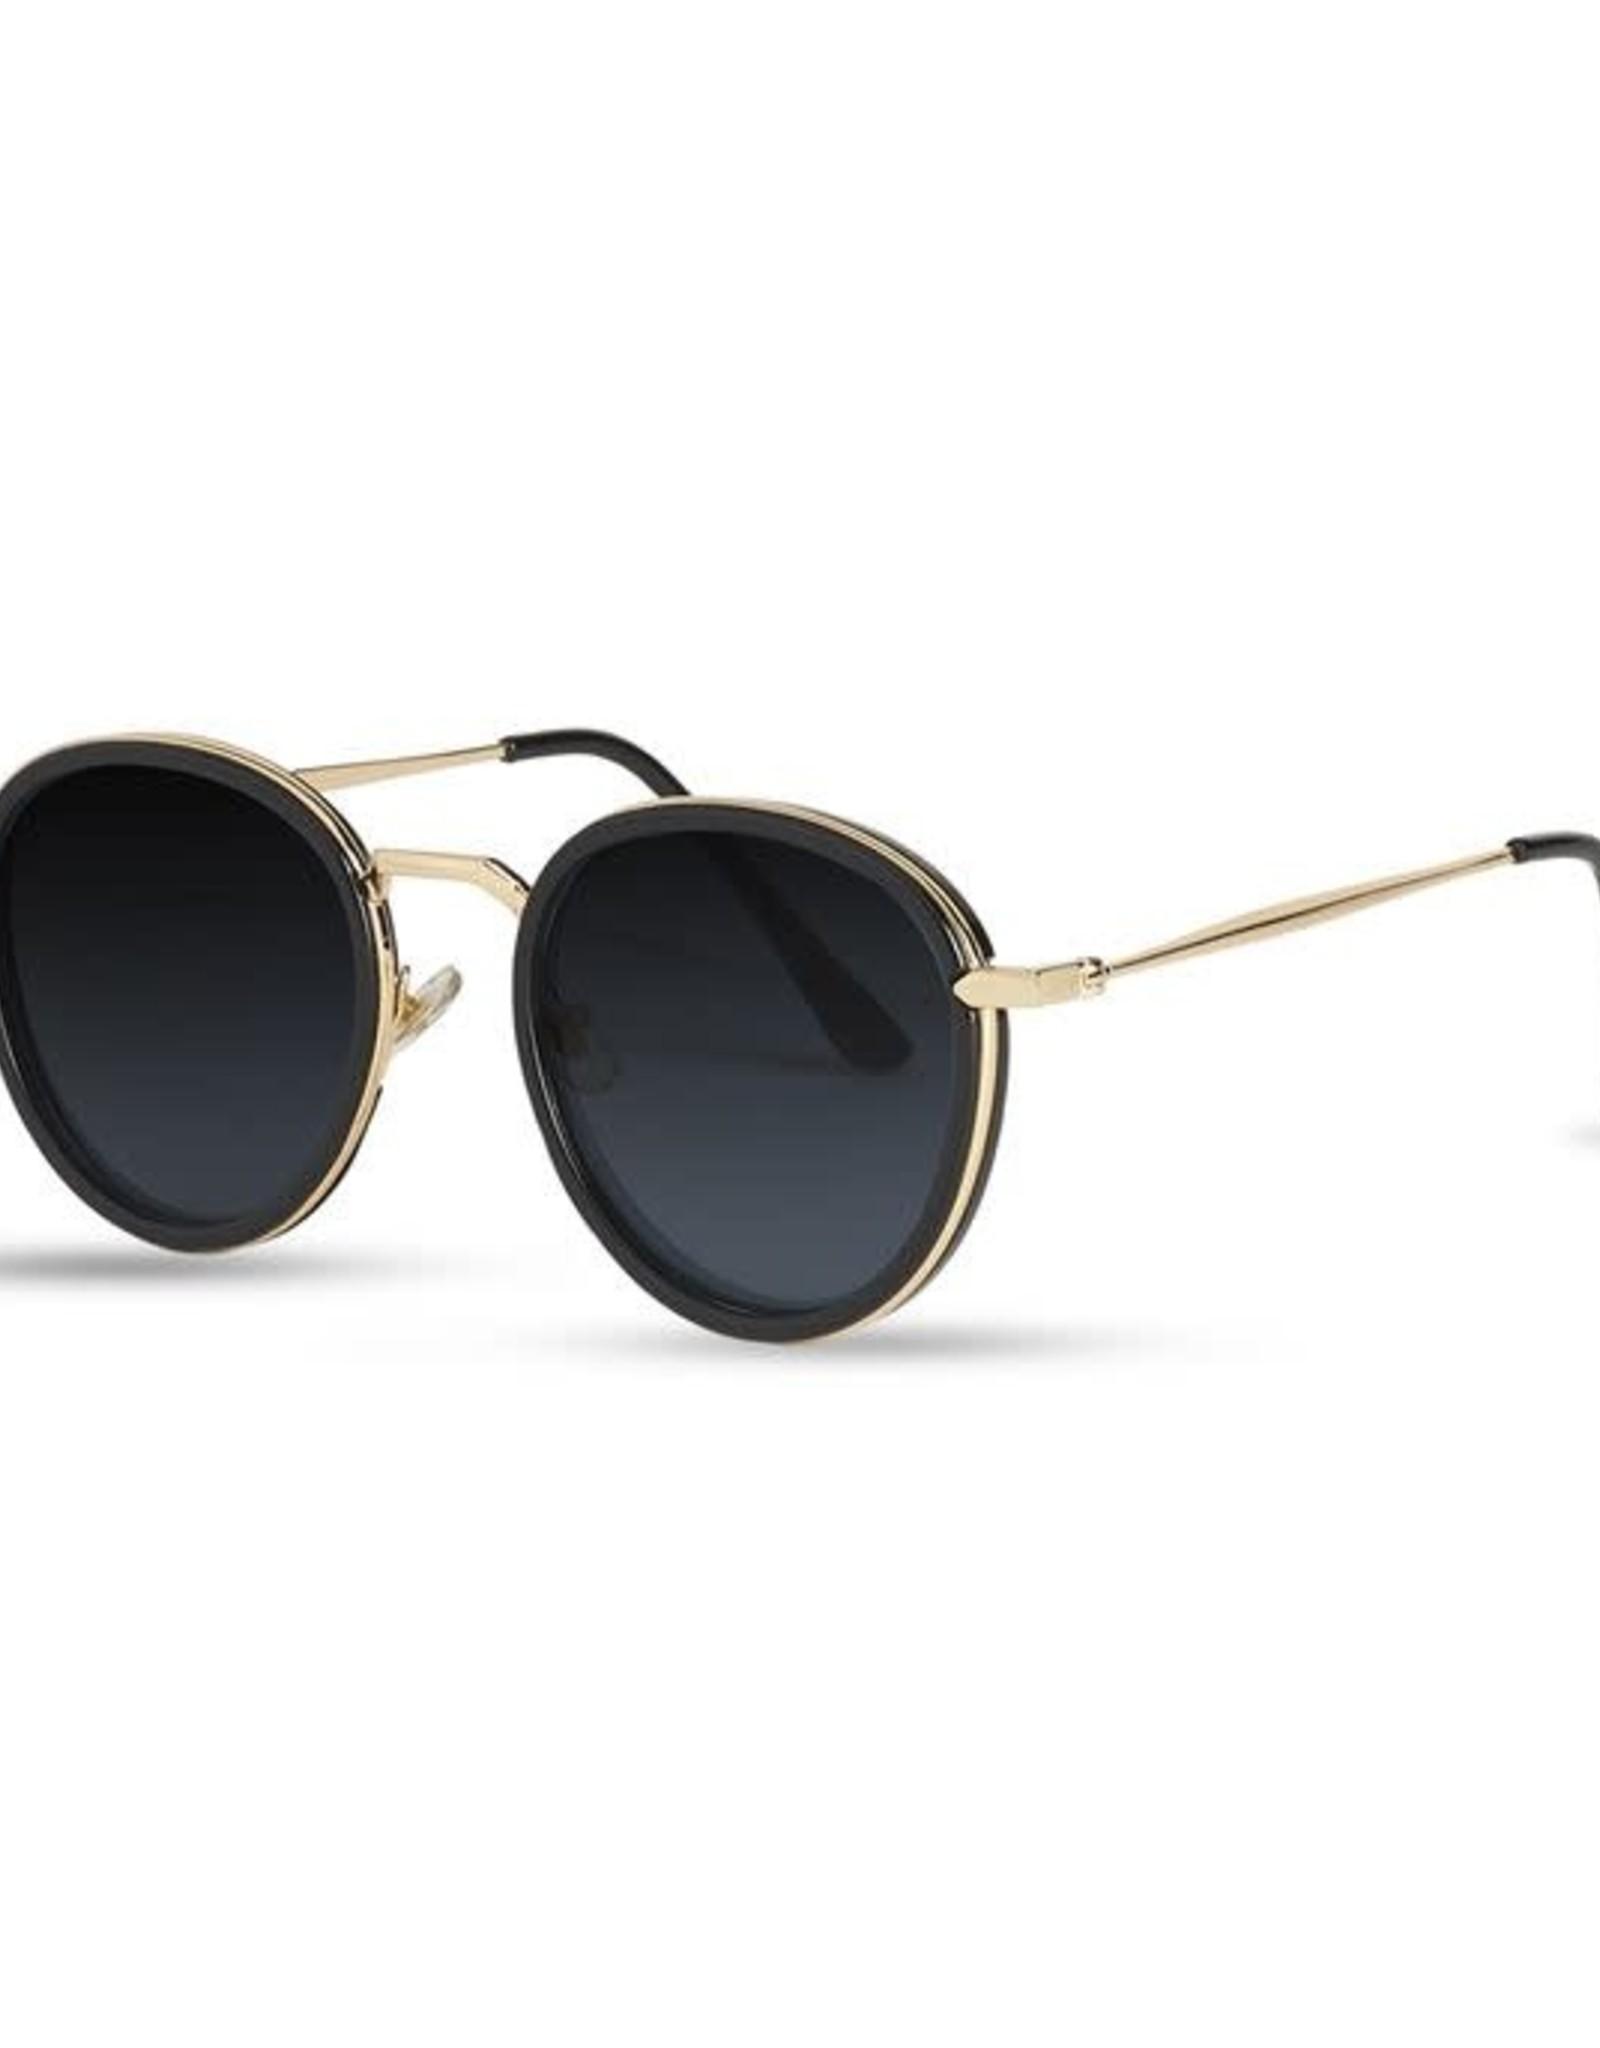 Coco & Carmen Zoe Runway Sunnies - Black Sunglasses